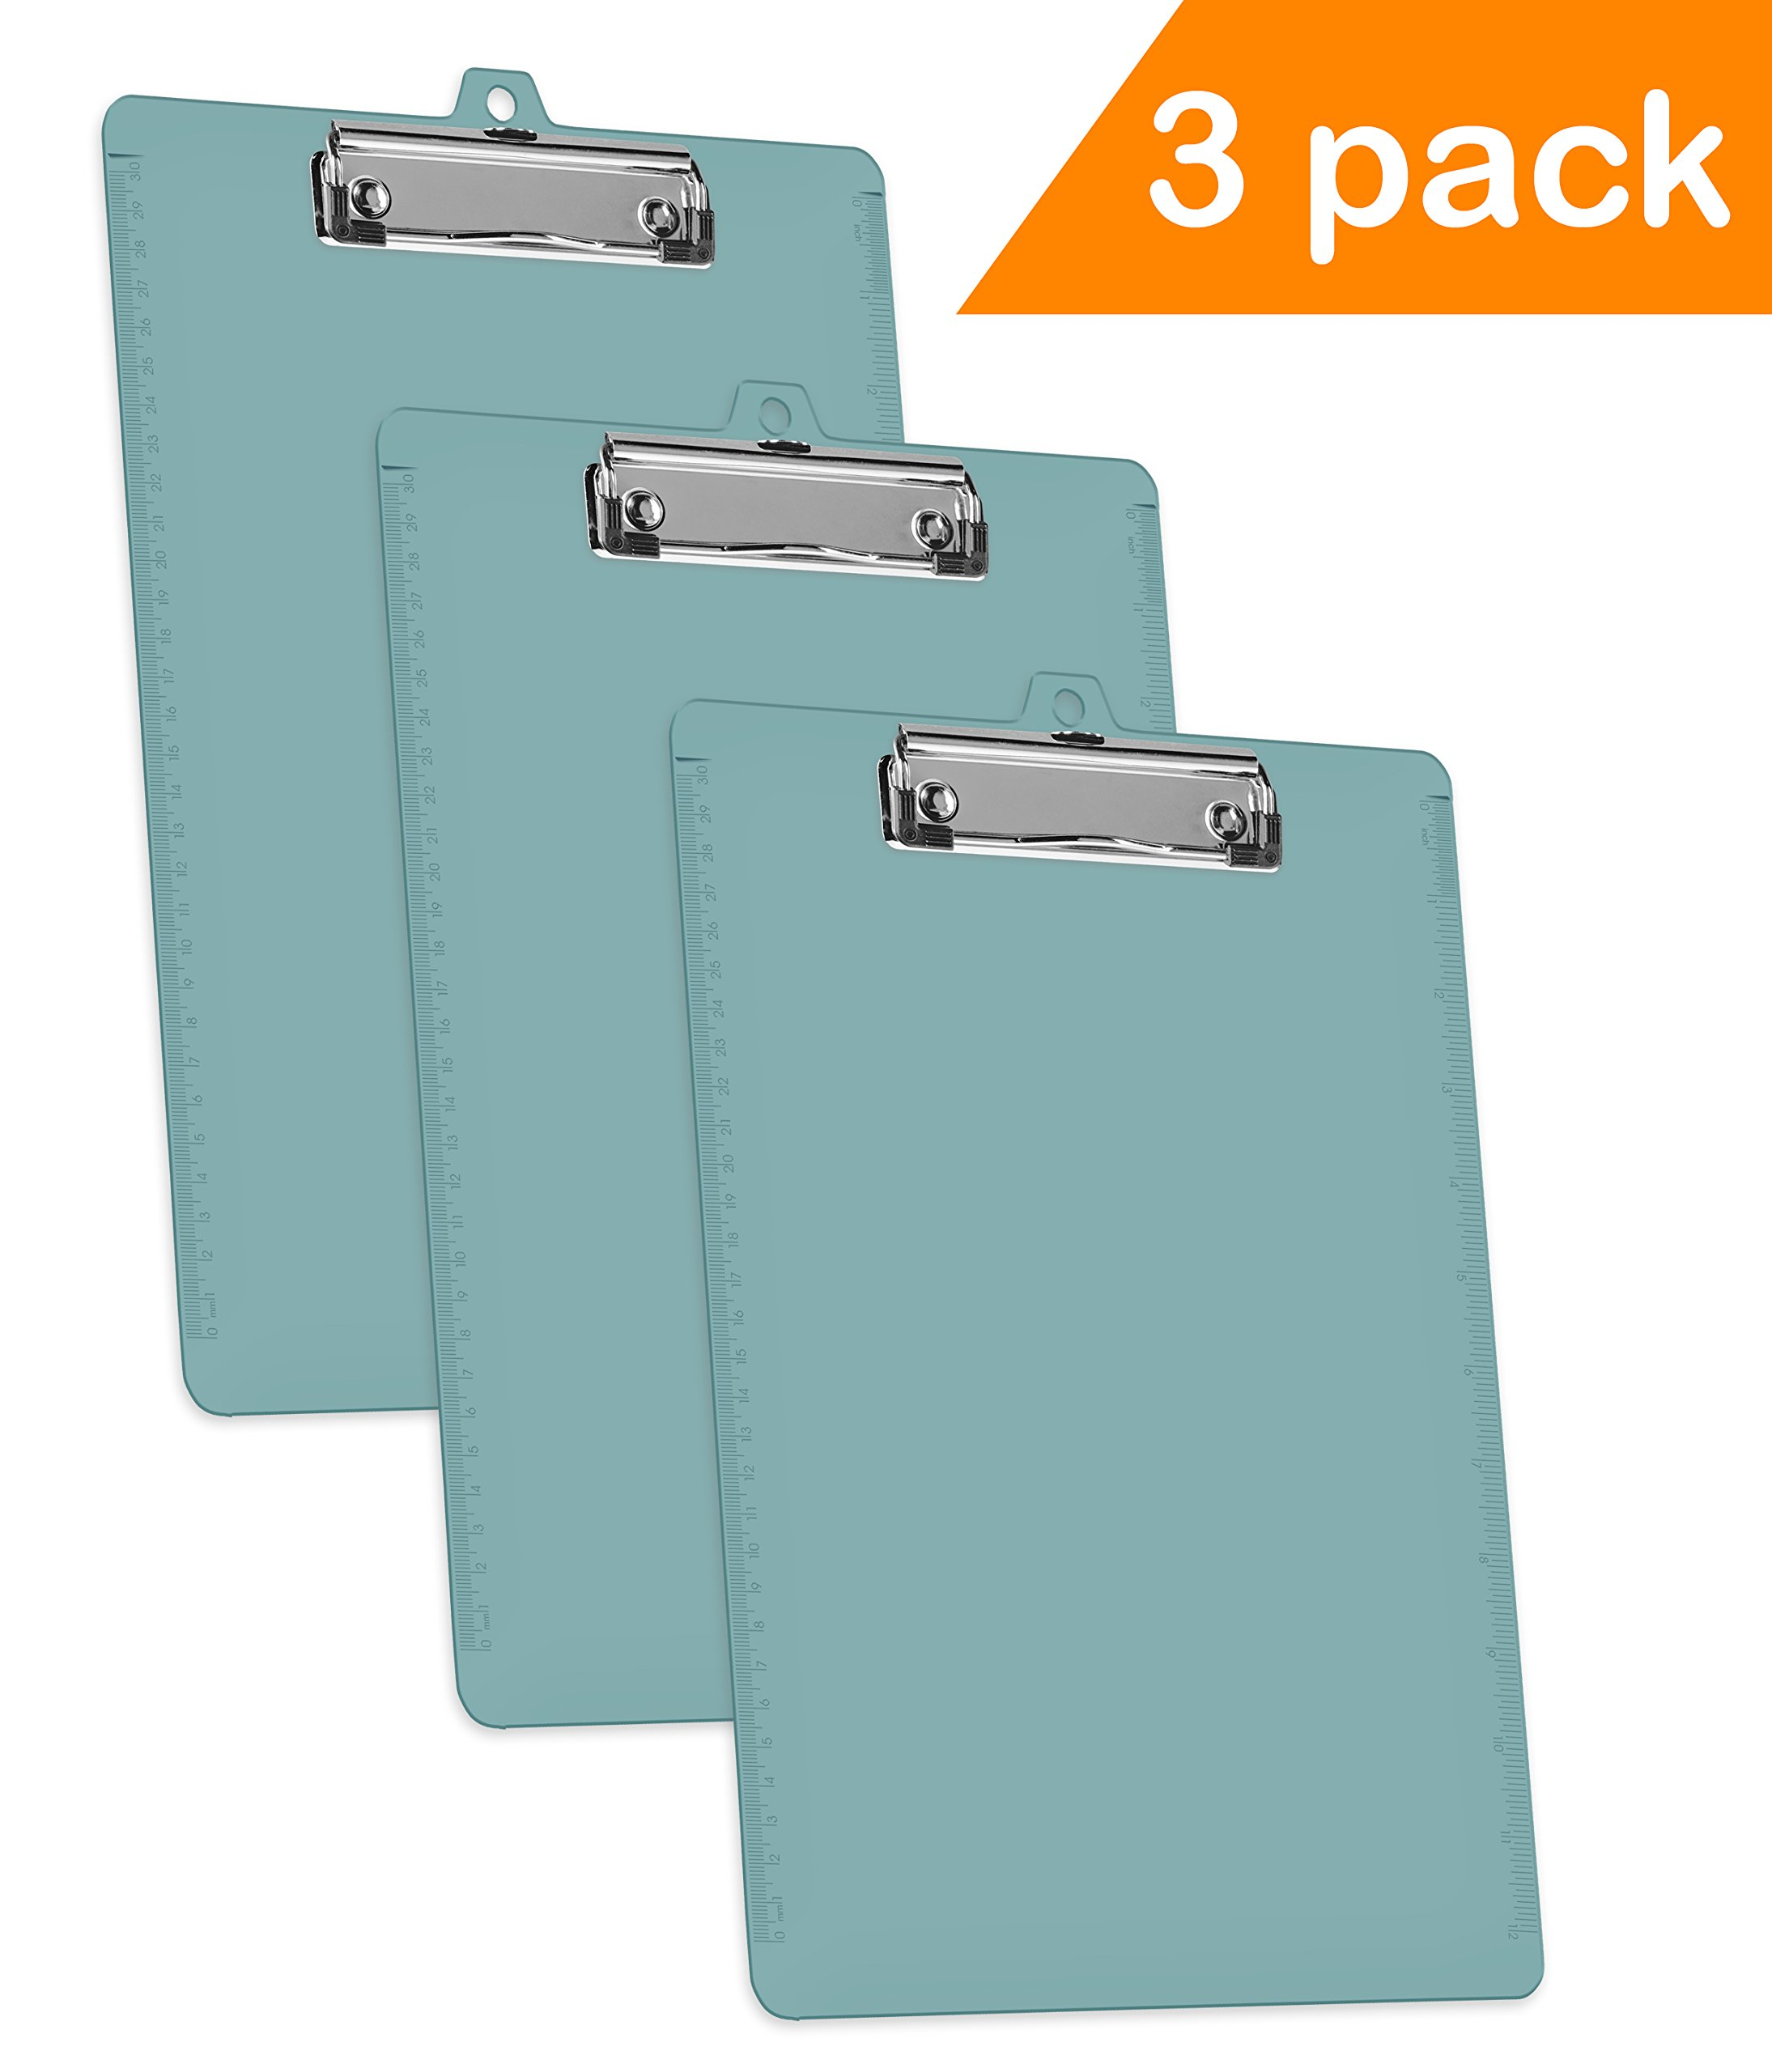 Acrimet Clipboard Low Profile Clip Letter Size (Solid Green Color) (3 Pack)